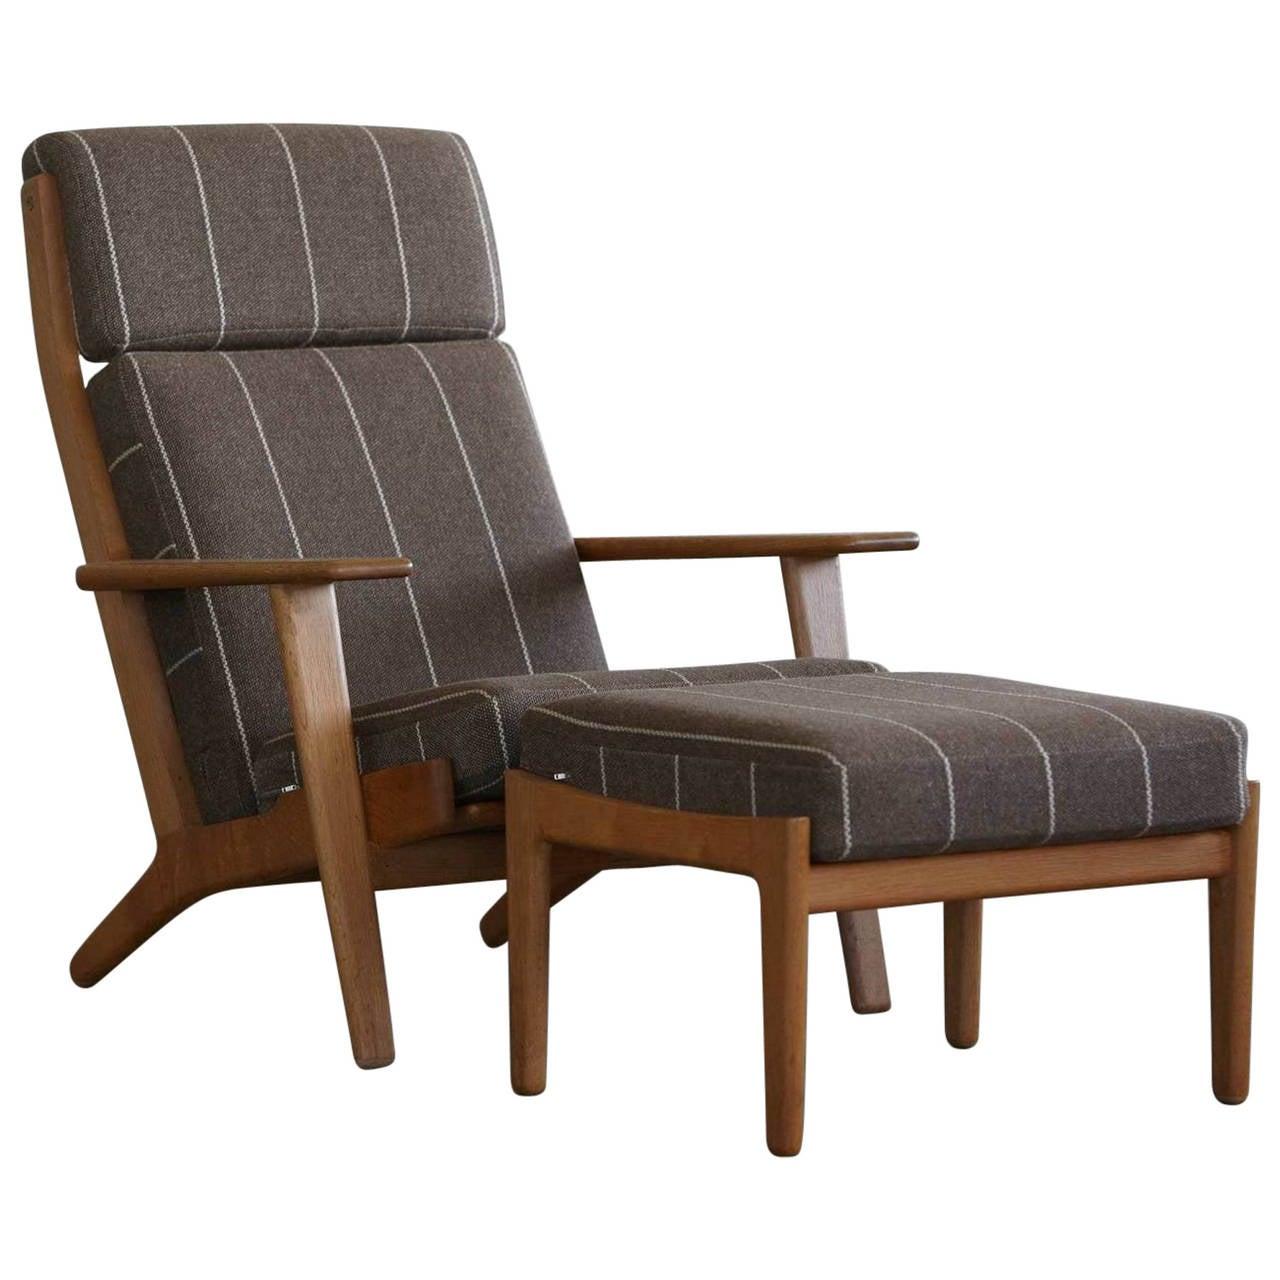 Hans j wegner high back chair and ottoman model ge290 at for Hans wegner queen chair